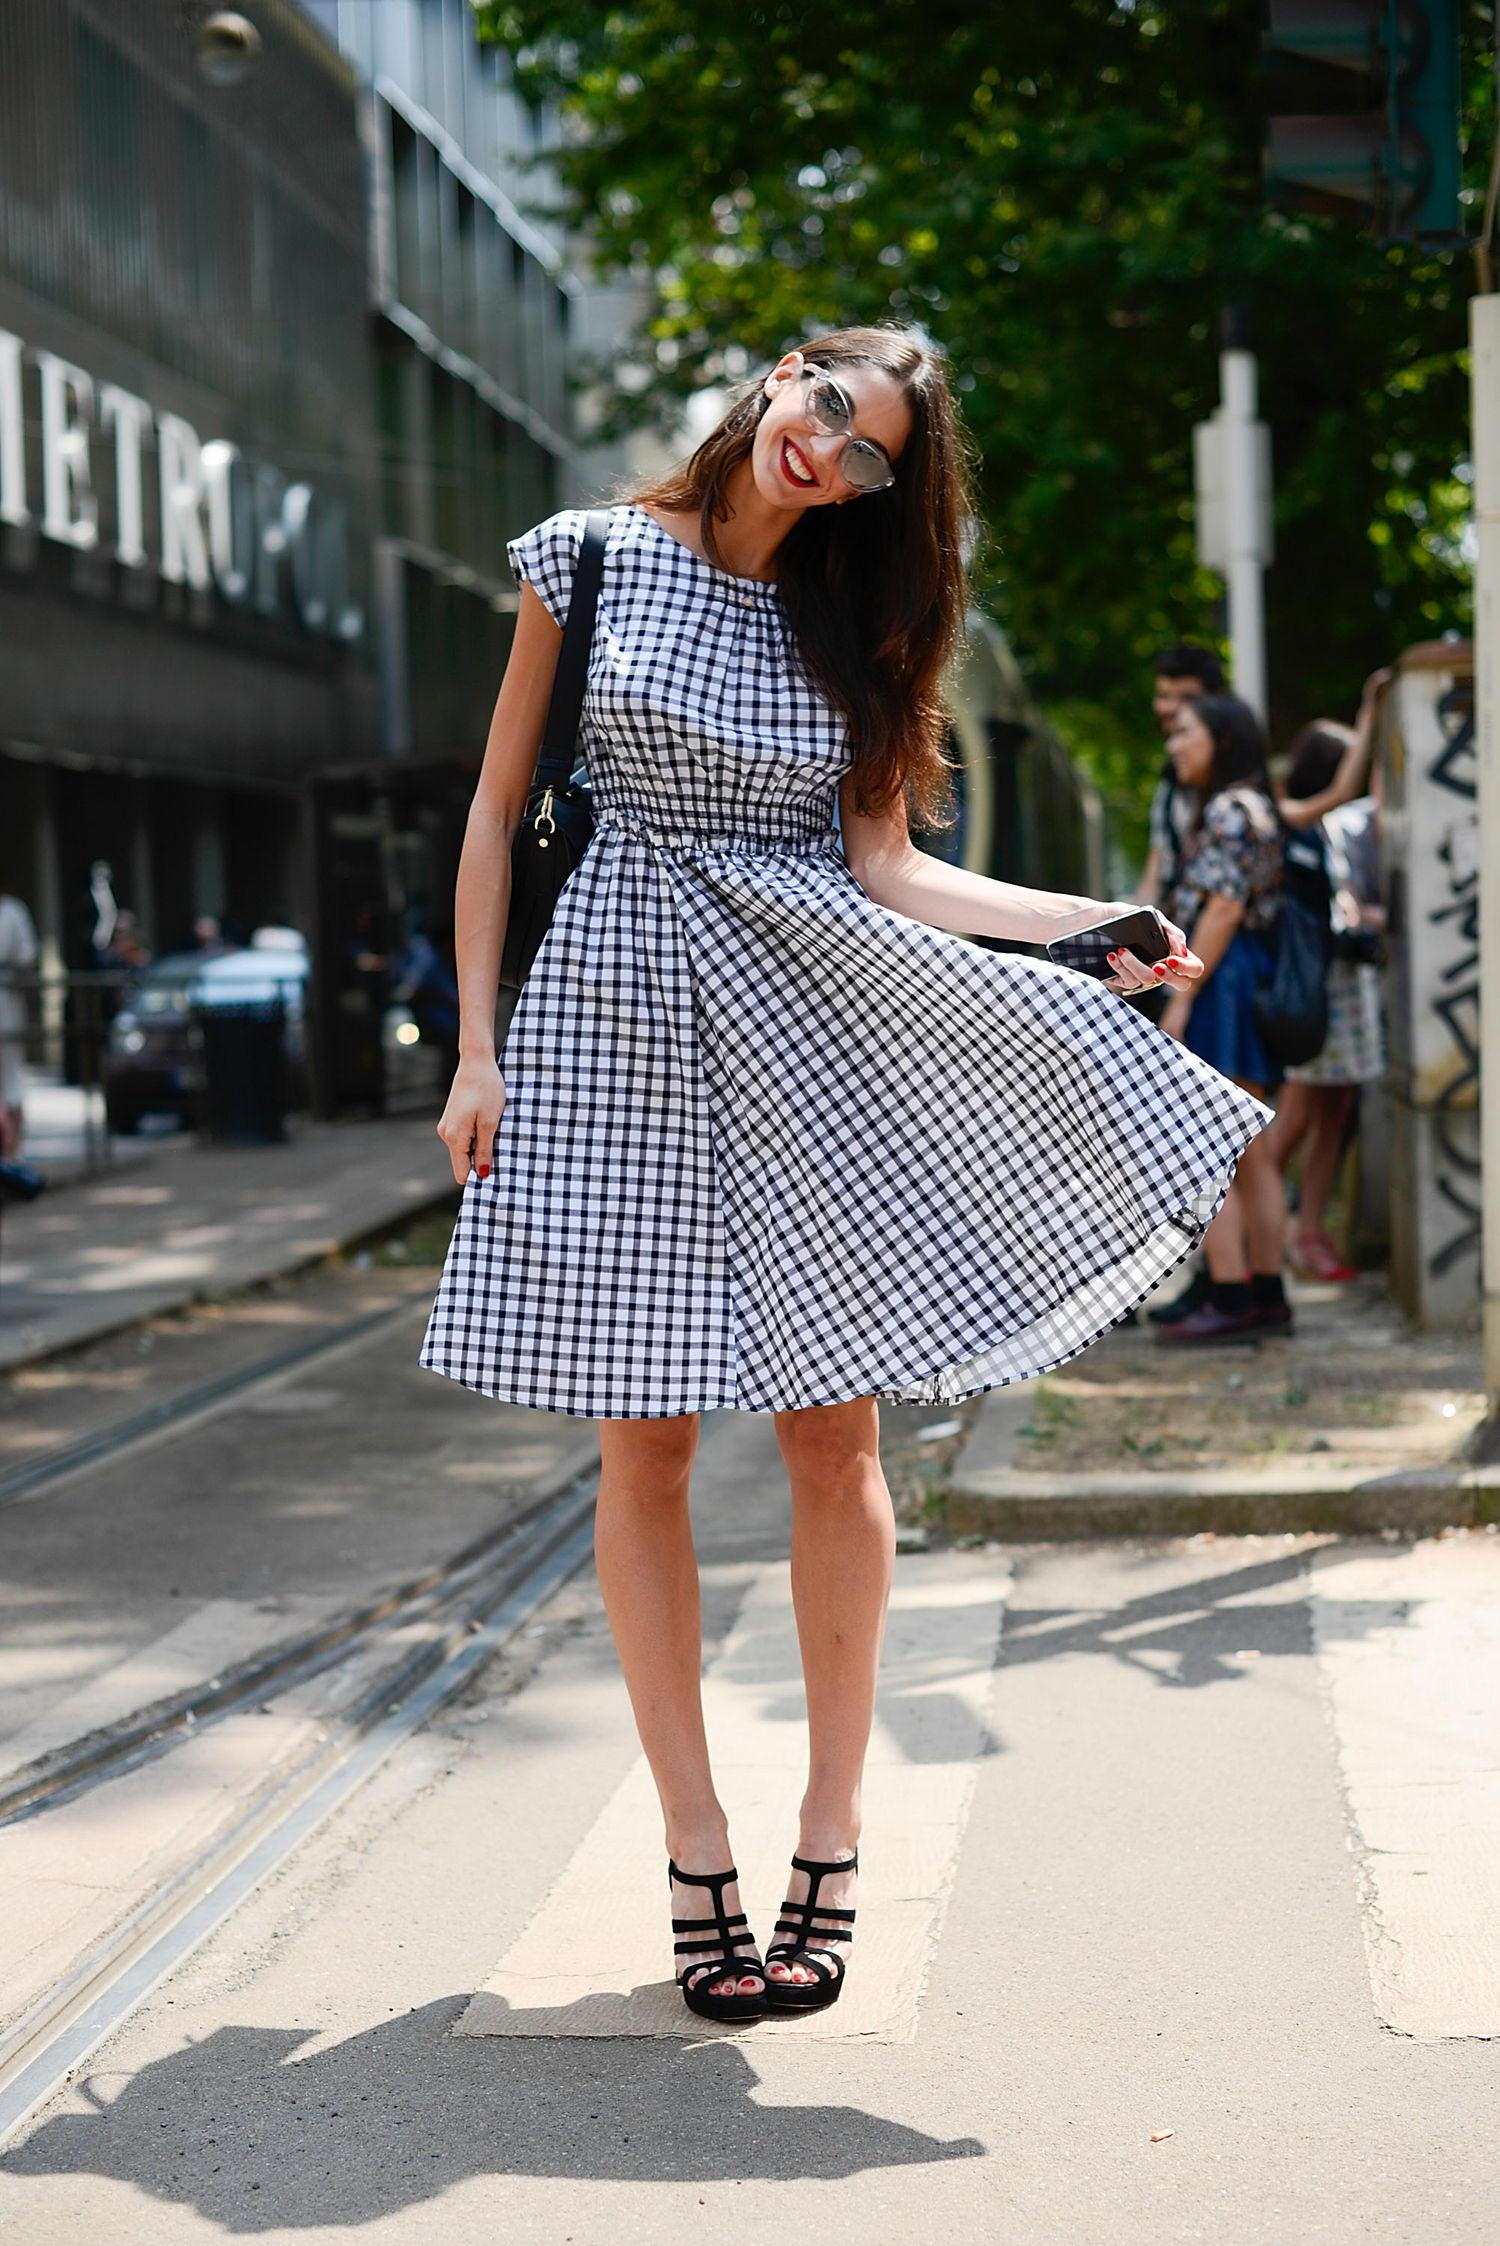 chic-milan-street-style-italian-fashion-38